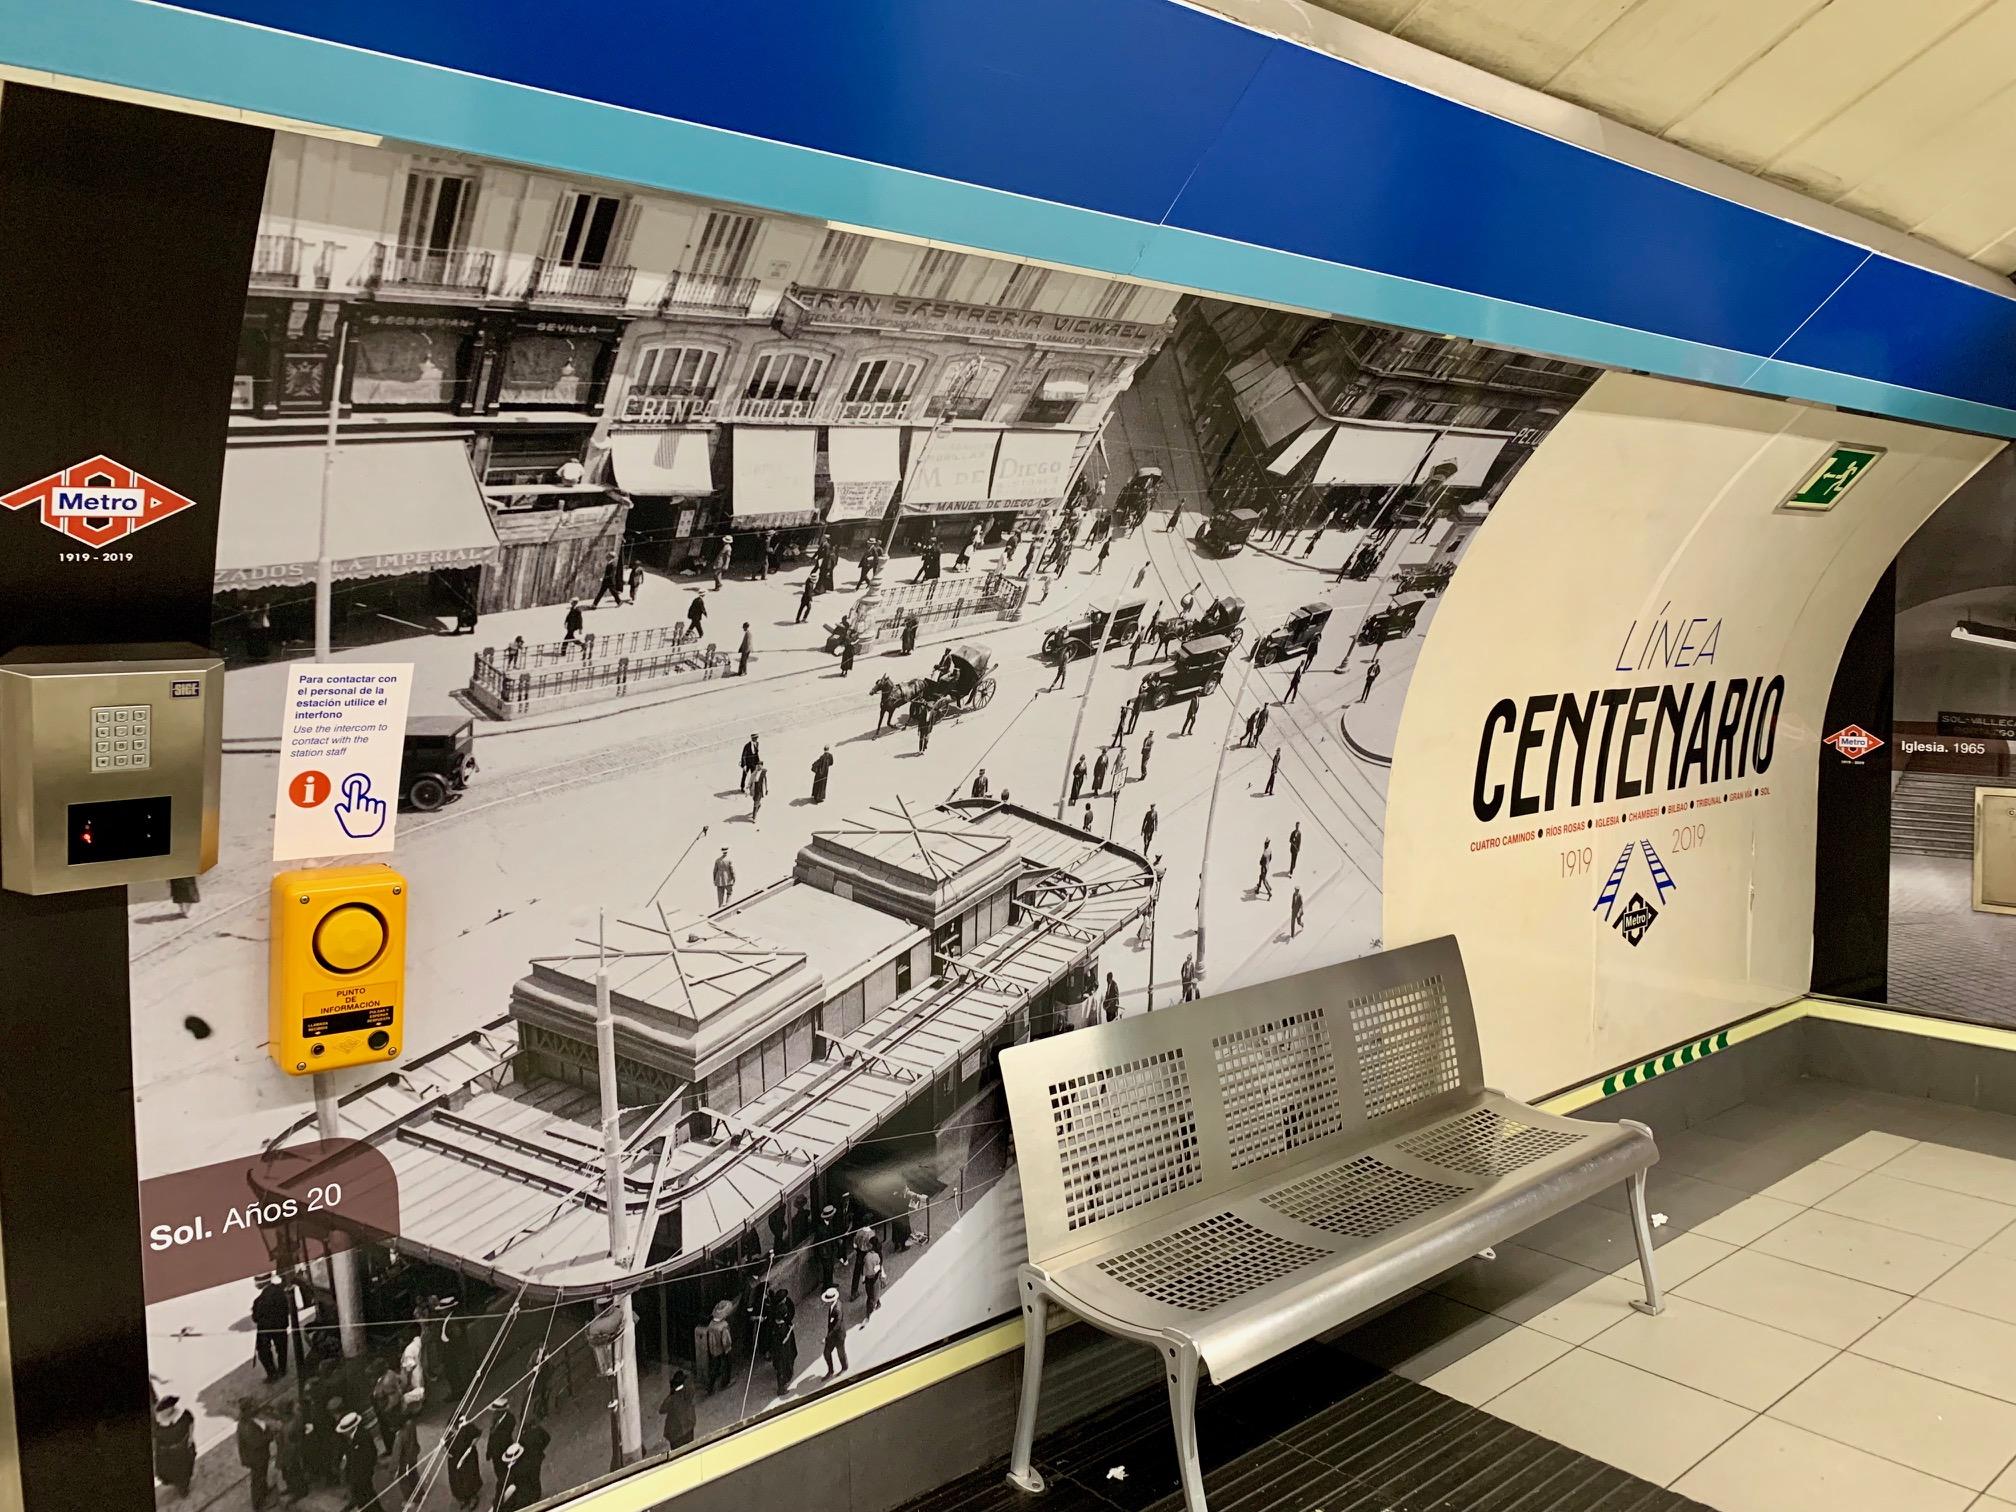 L2F Jul 19 pic Spain Madrid metro Tribunal Centenario